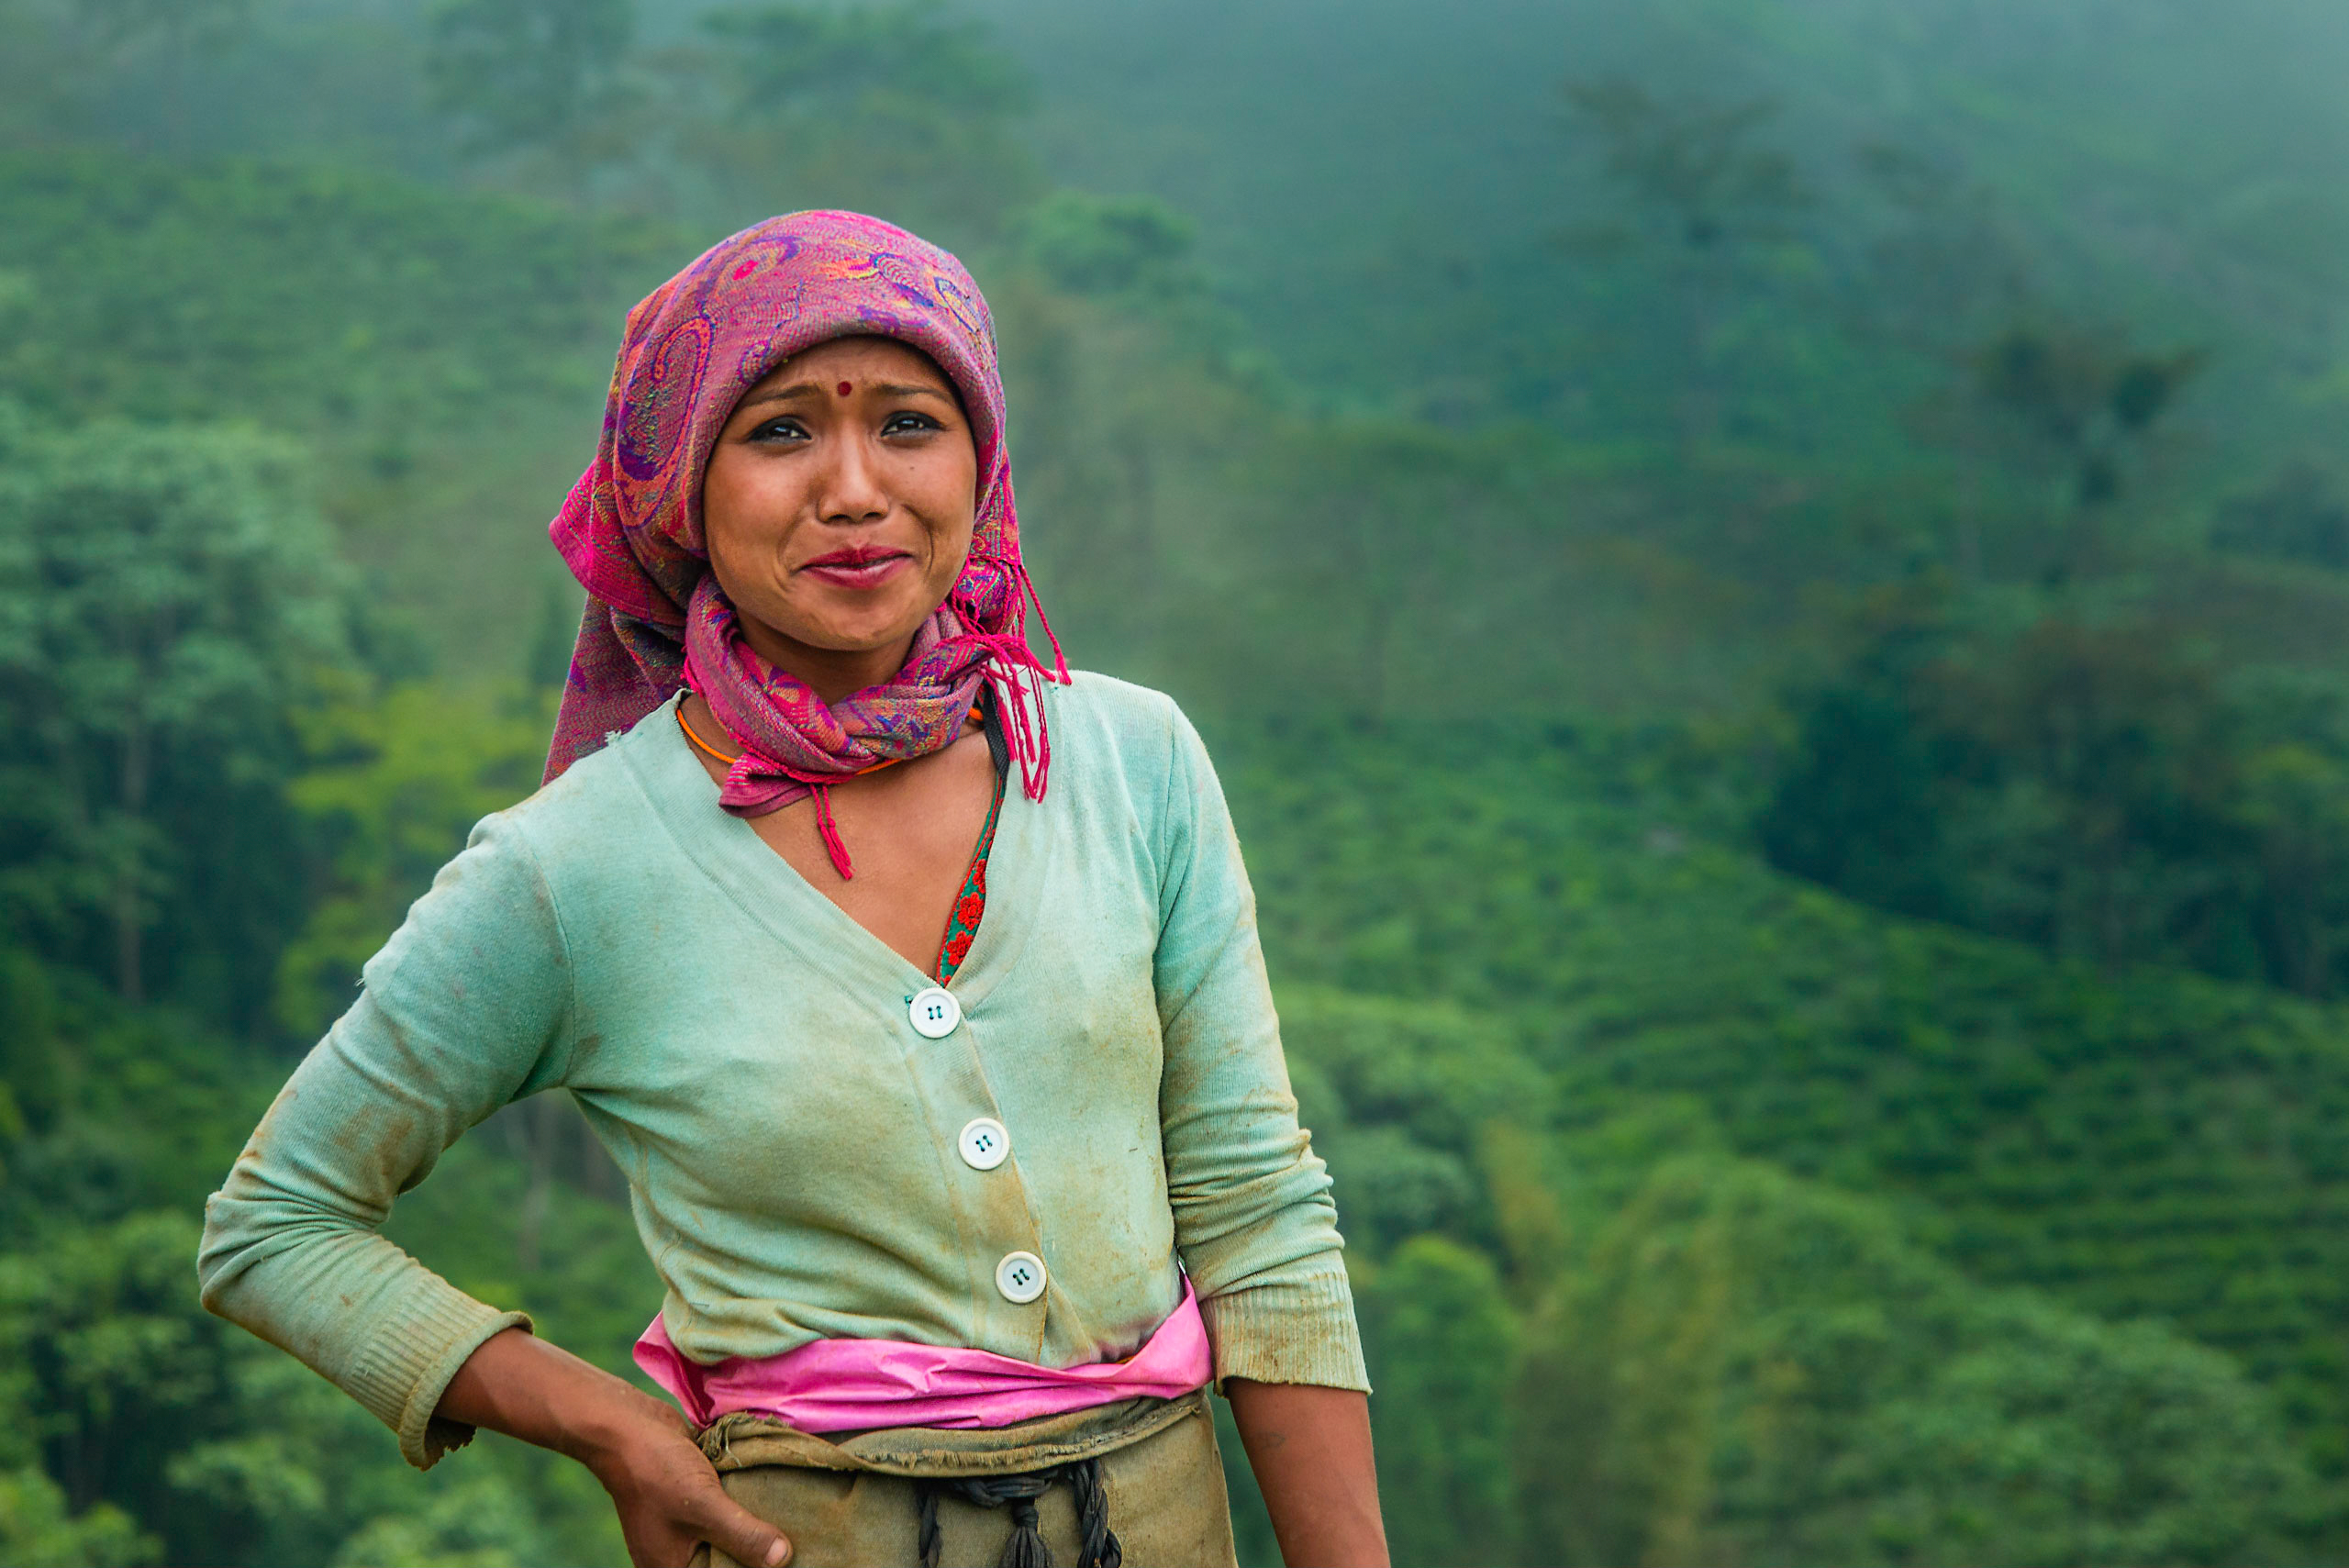 Plantation de thé de Darjeeling, Nord-Est de l'Inde